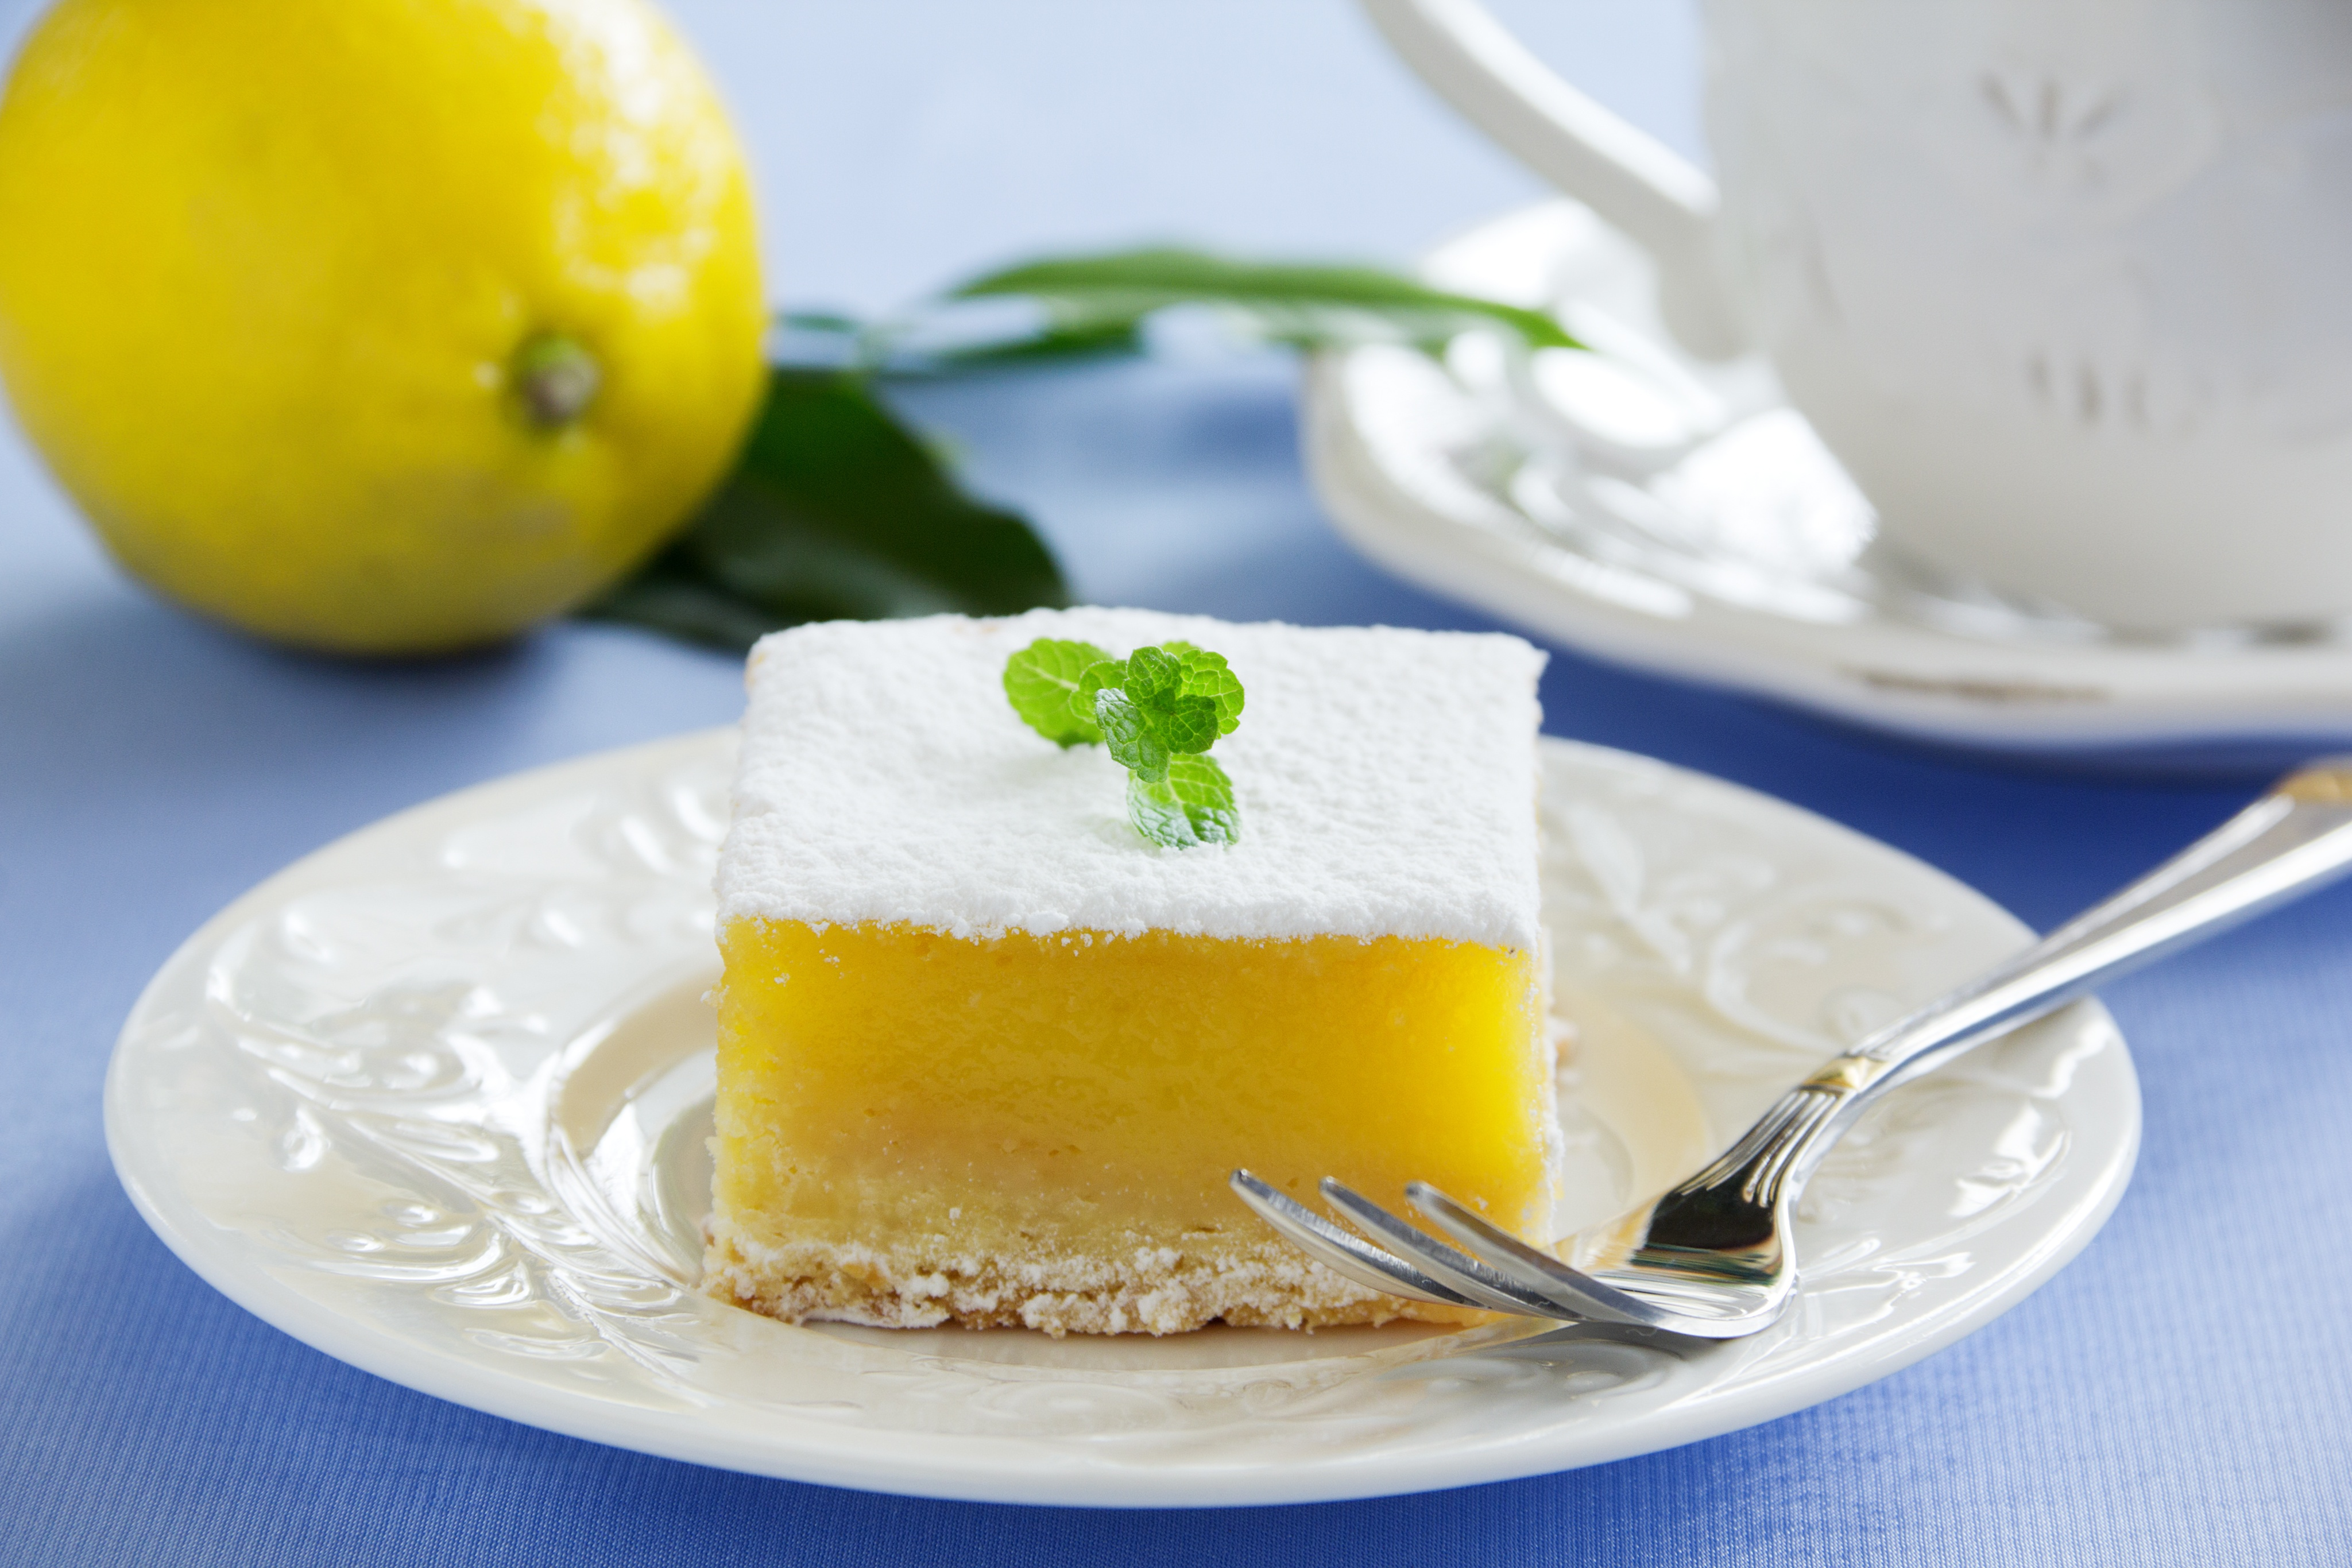 Lemon Cloud Dessert or dream bar is a sweet treat for Easter